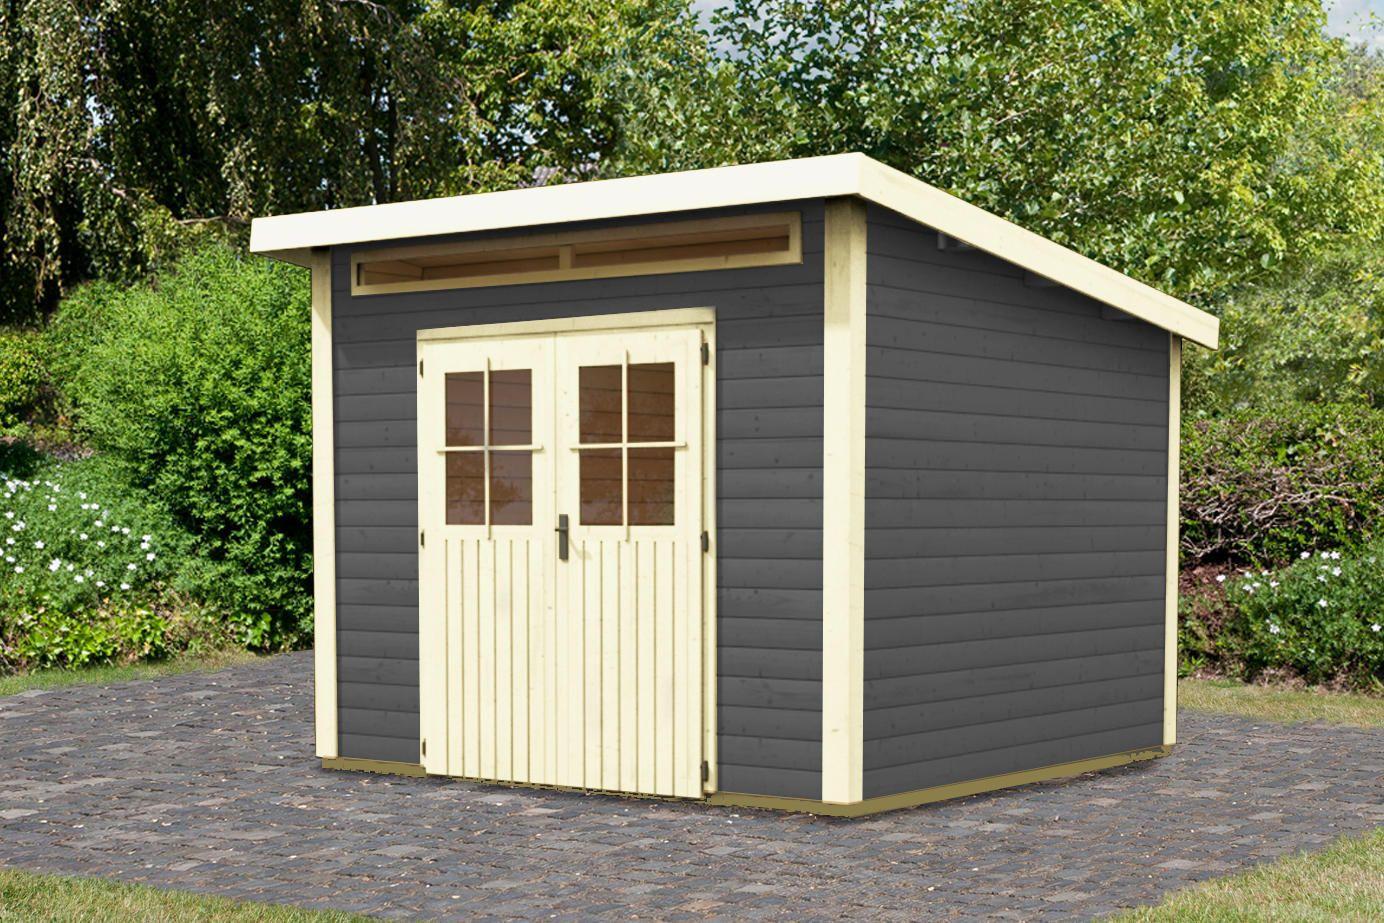 PultdachGartenhäuser Kulpin von Woodfeeling, 28 mm